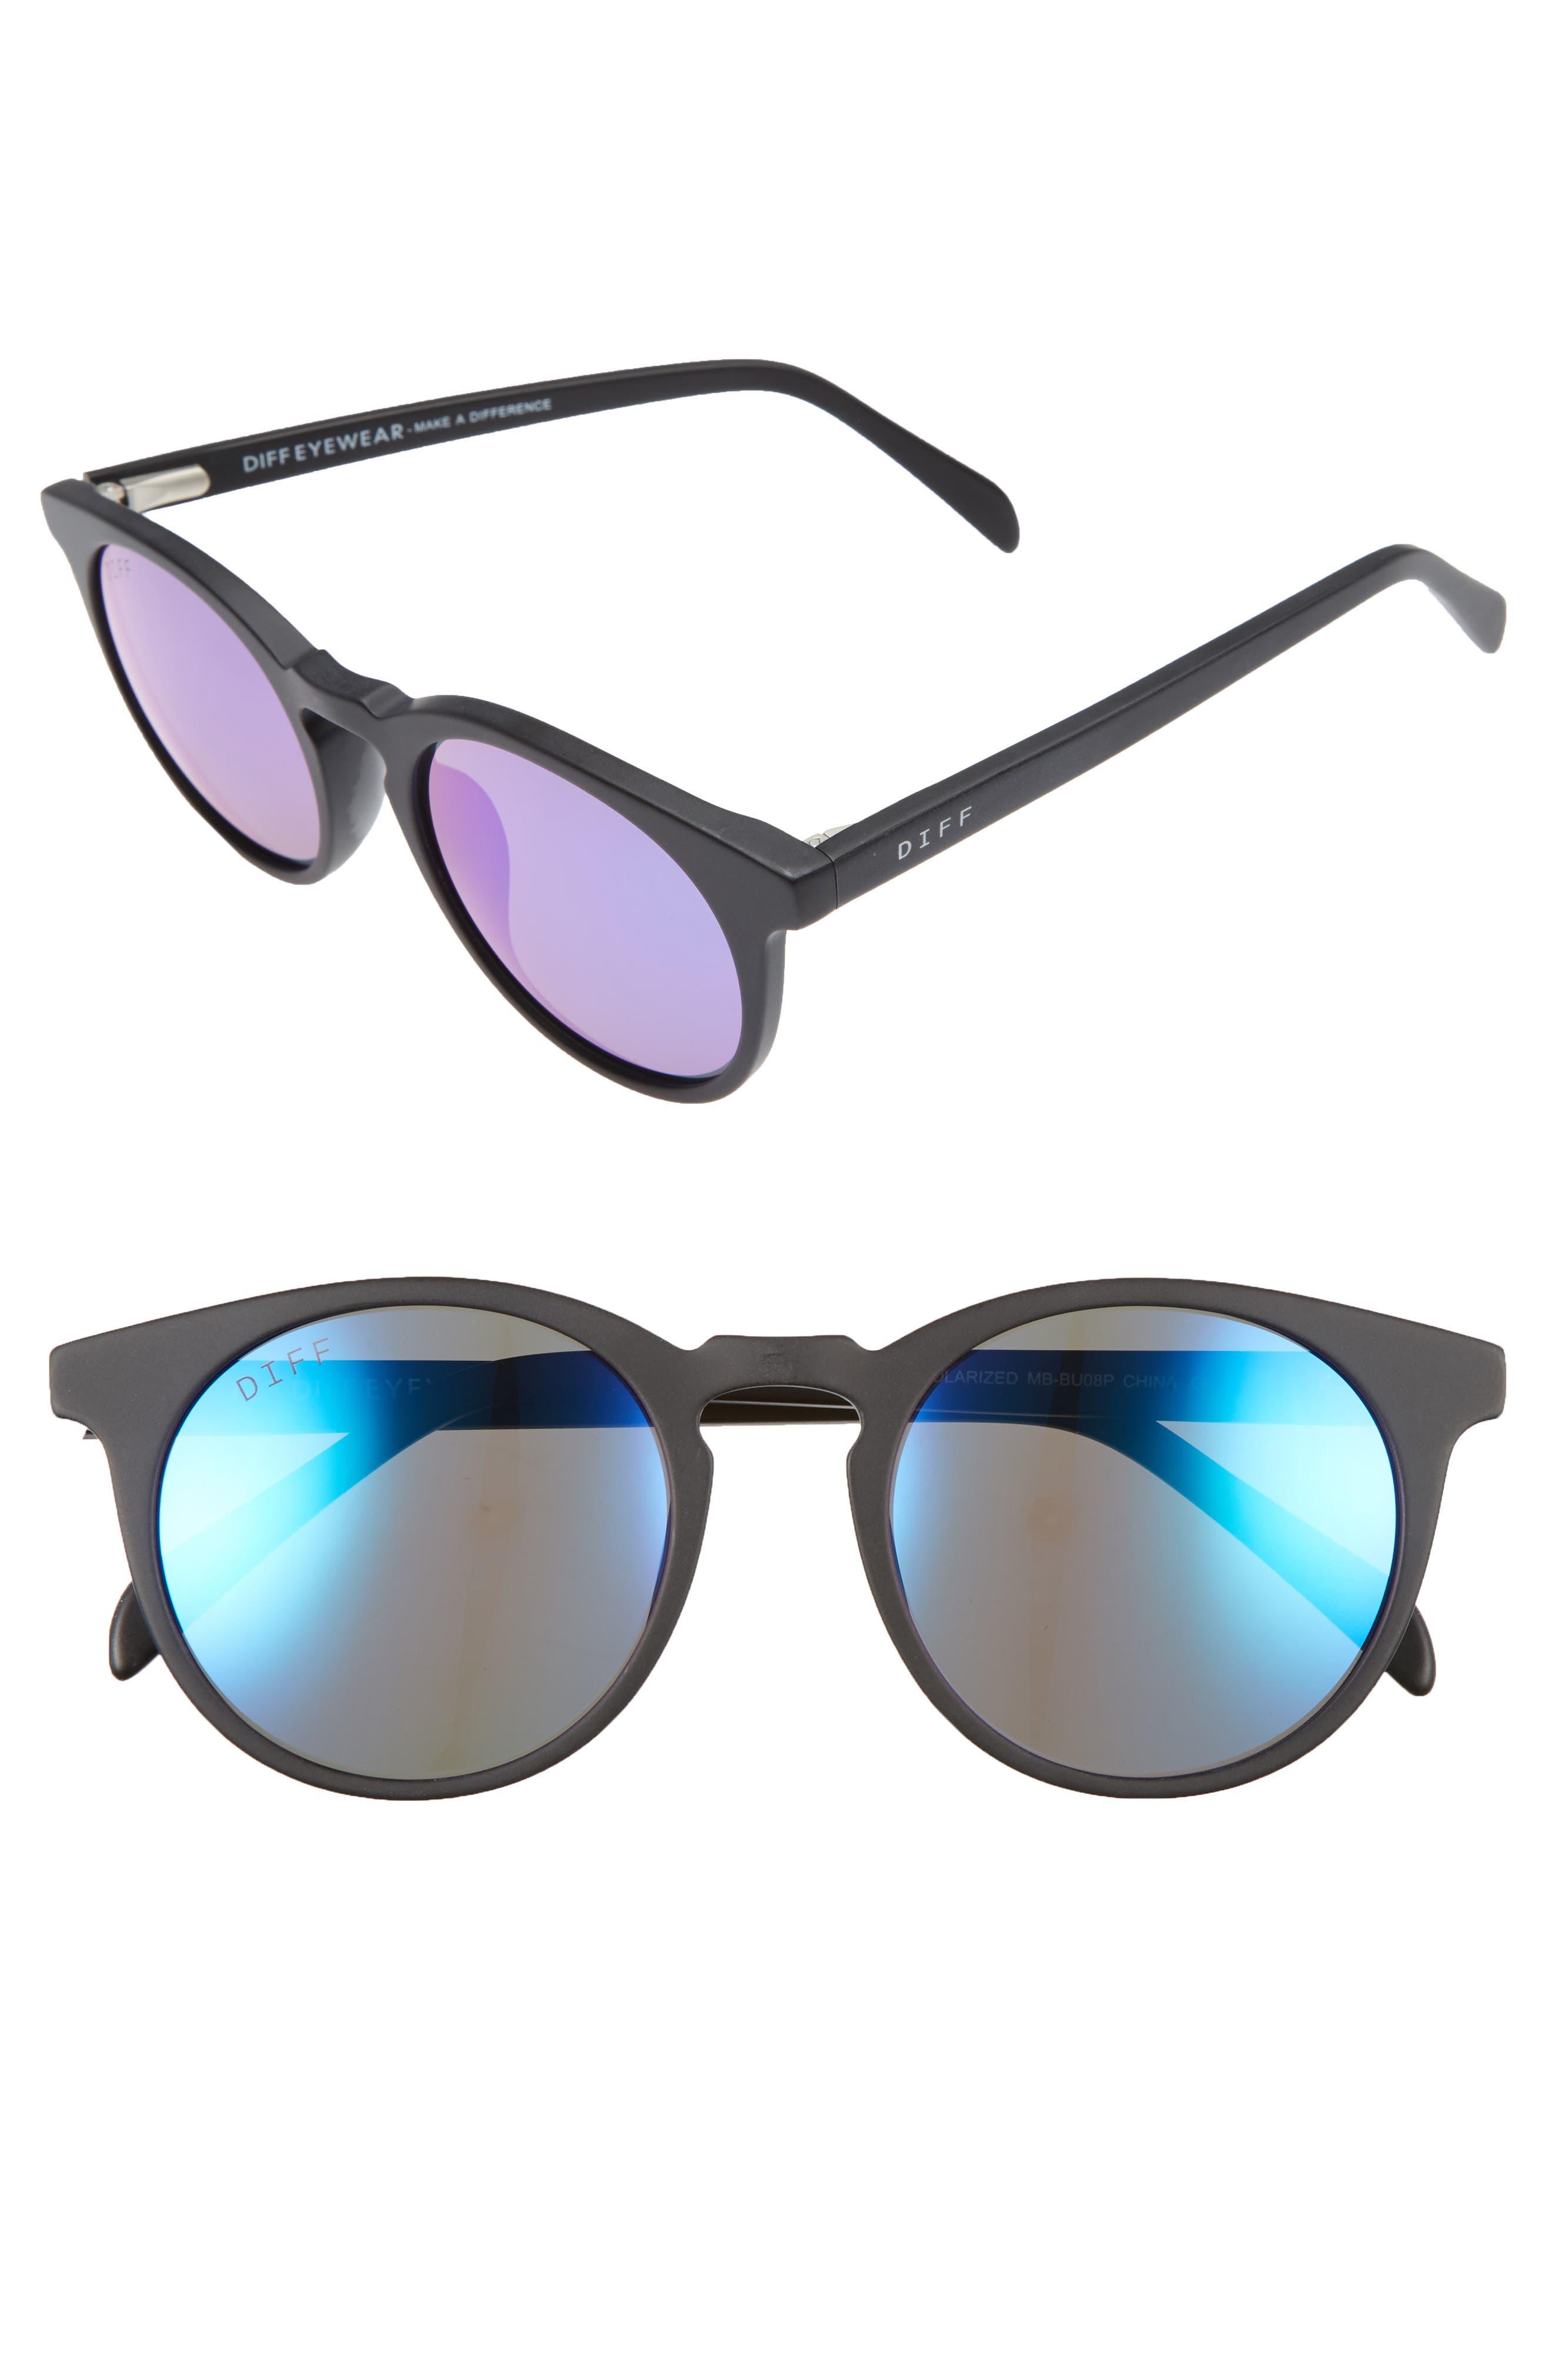 Charlie 48mm Mirrored Polarized Round Retro Sunglasses,                         Main,                         color, 001